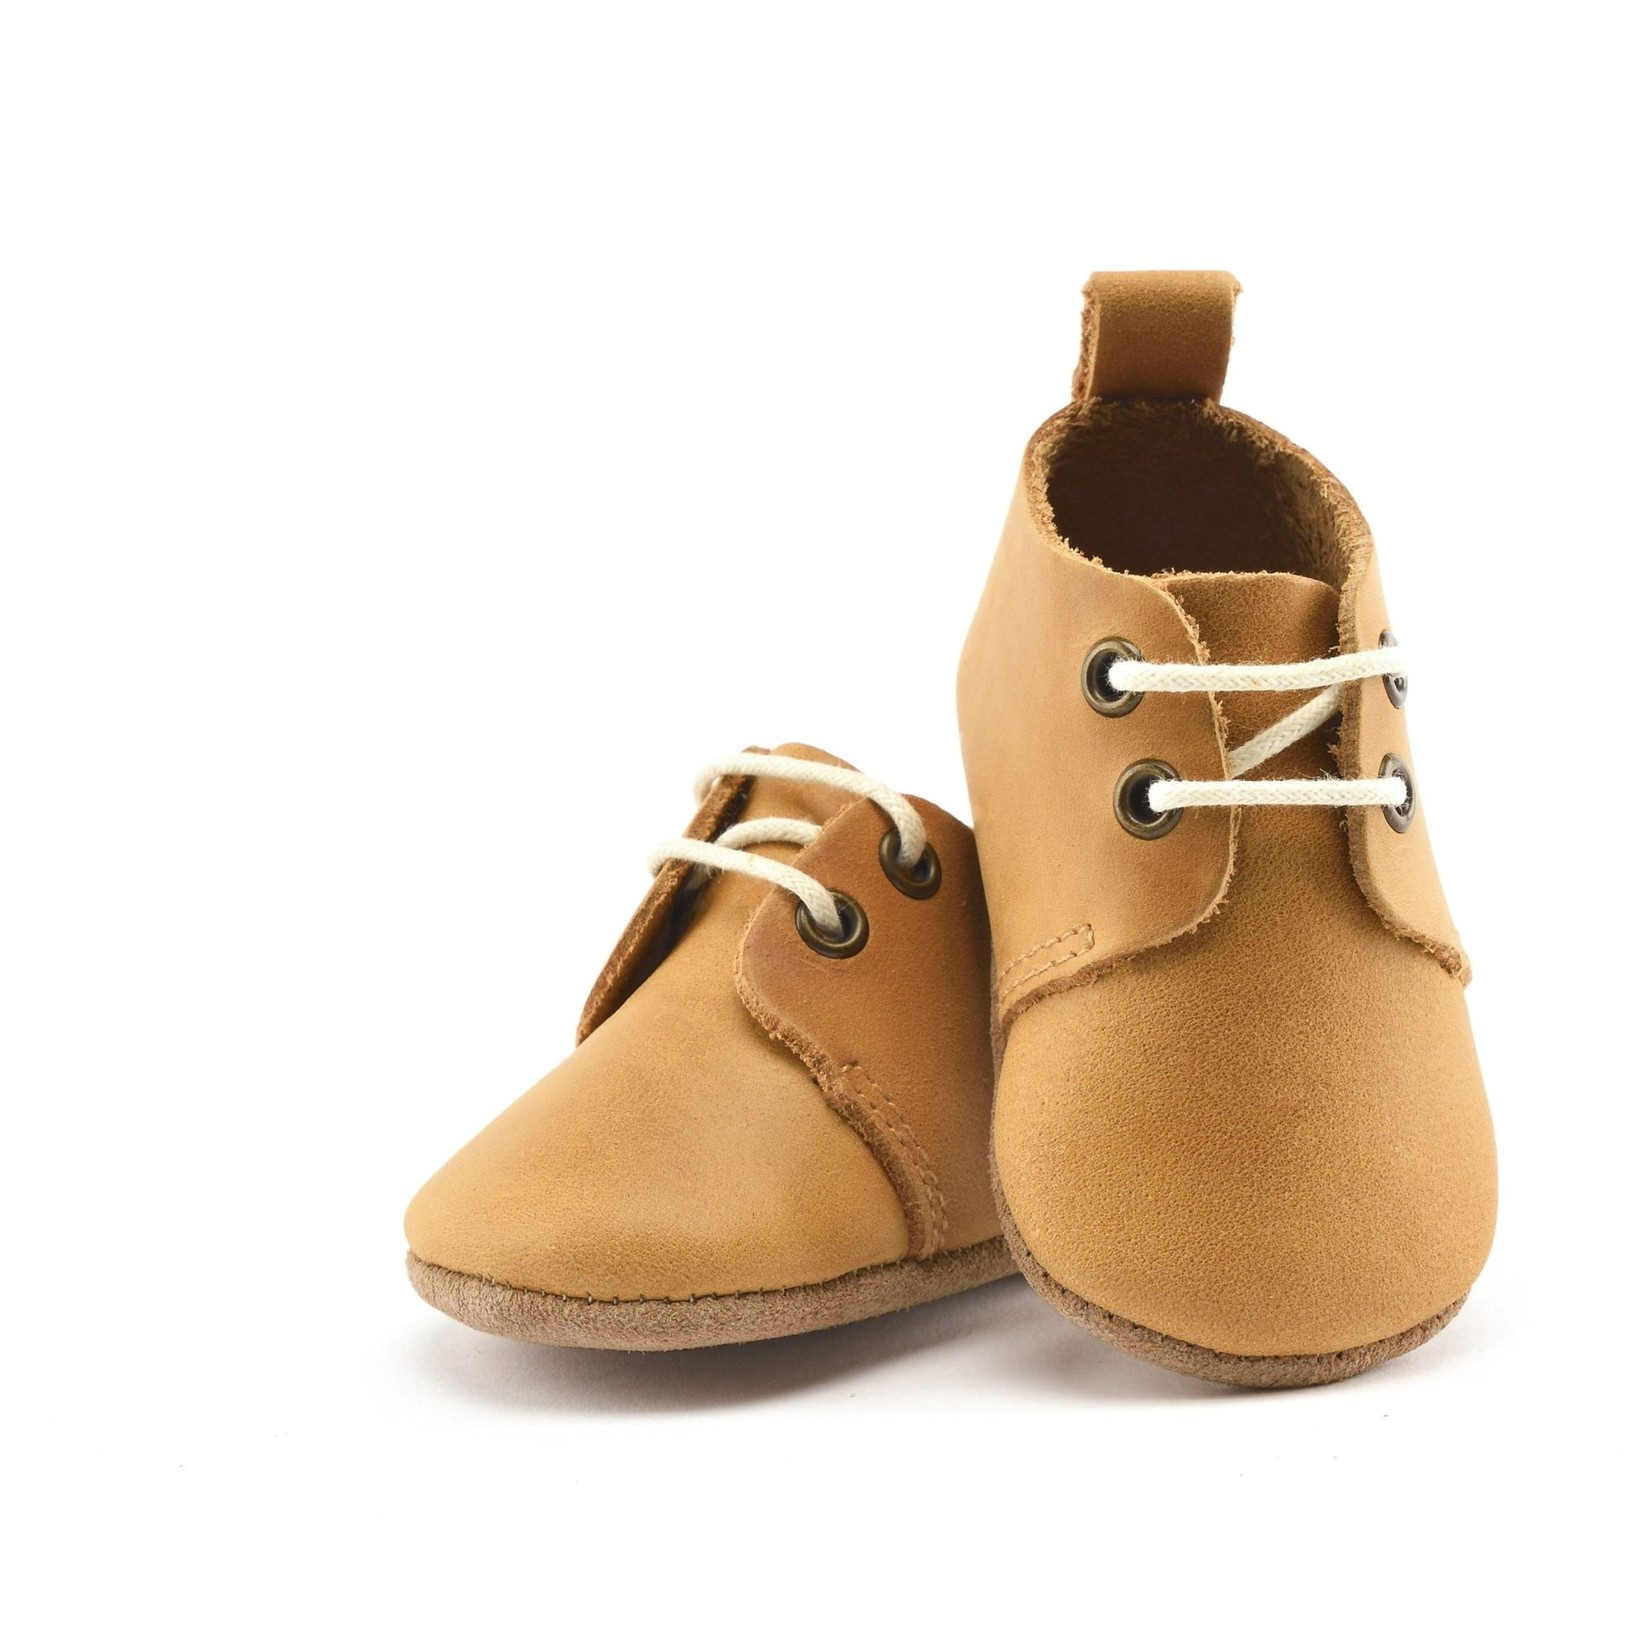 Premium Leather Oxfords - Natural - Soft Sole